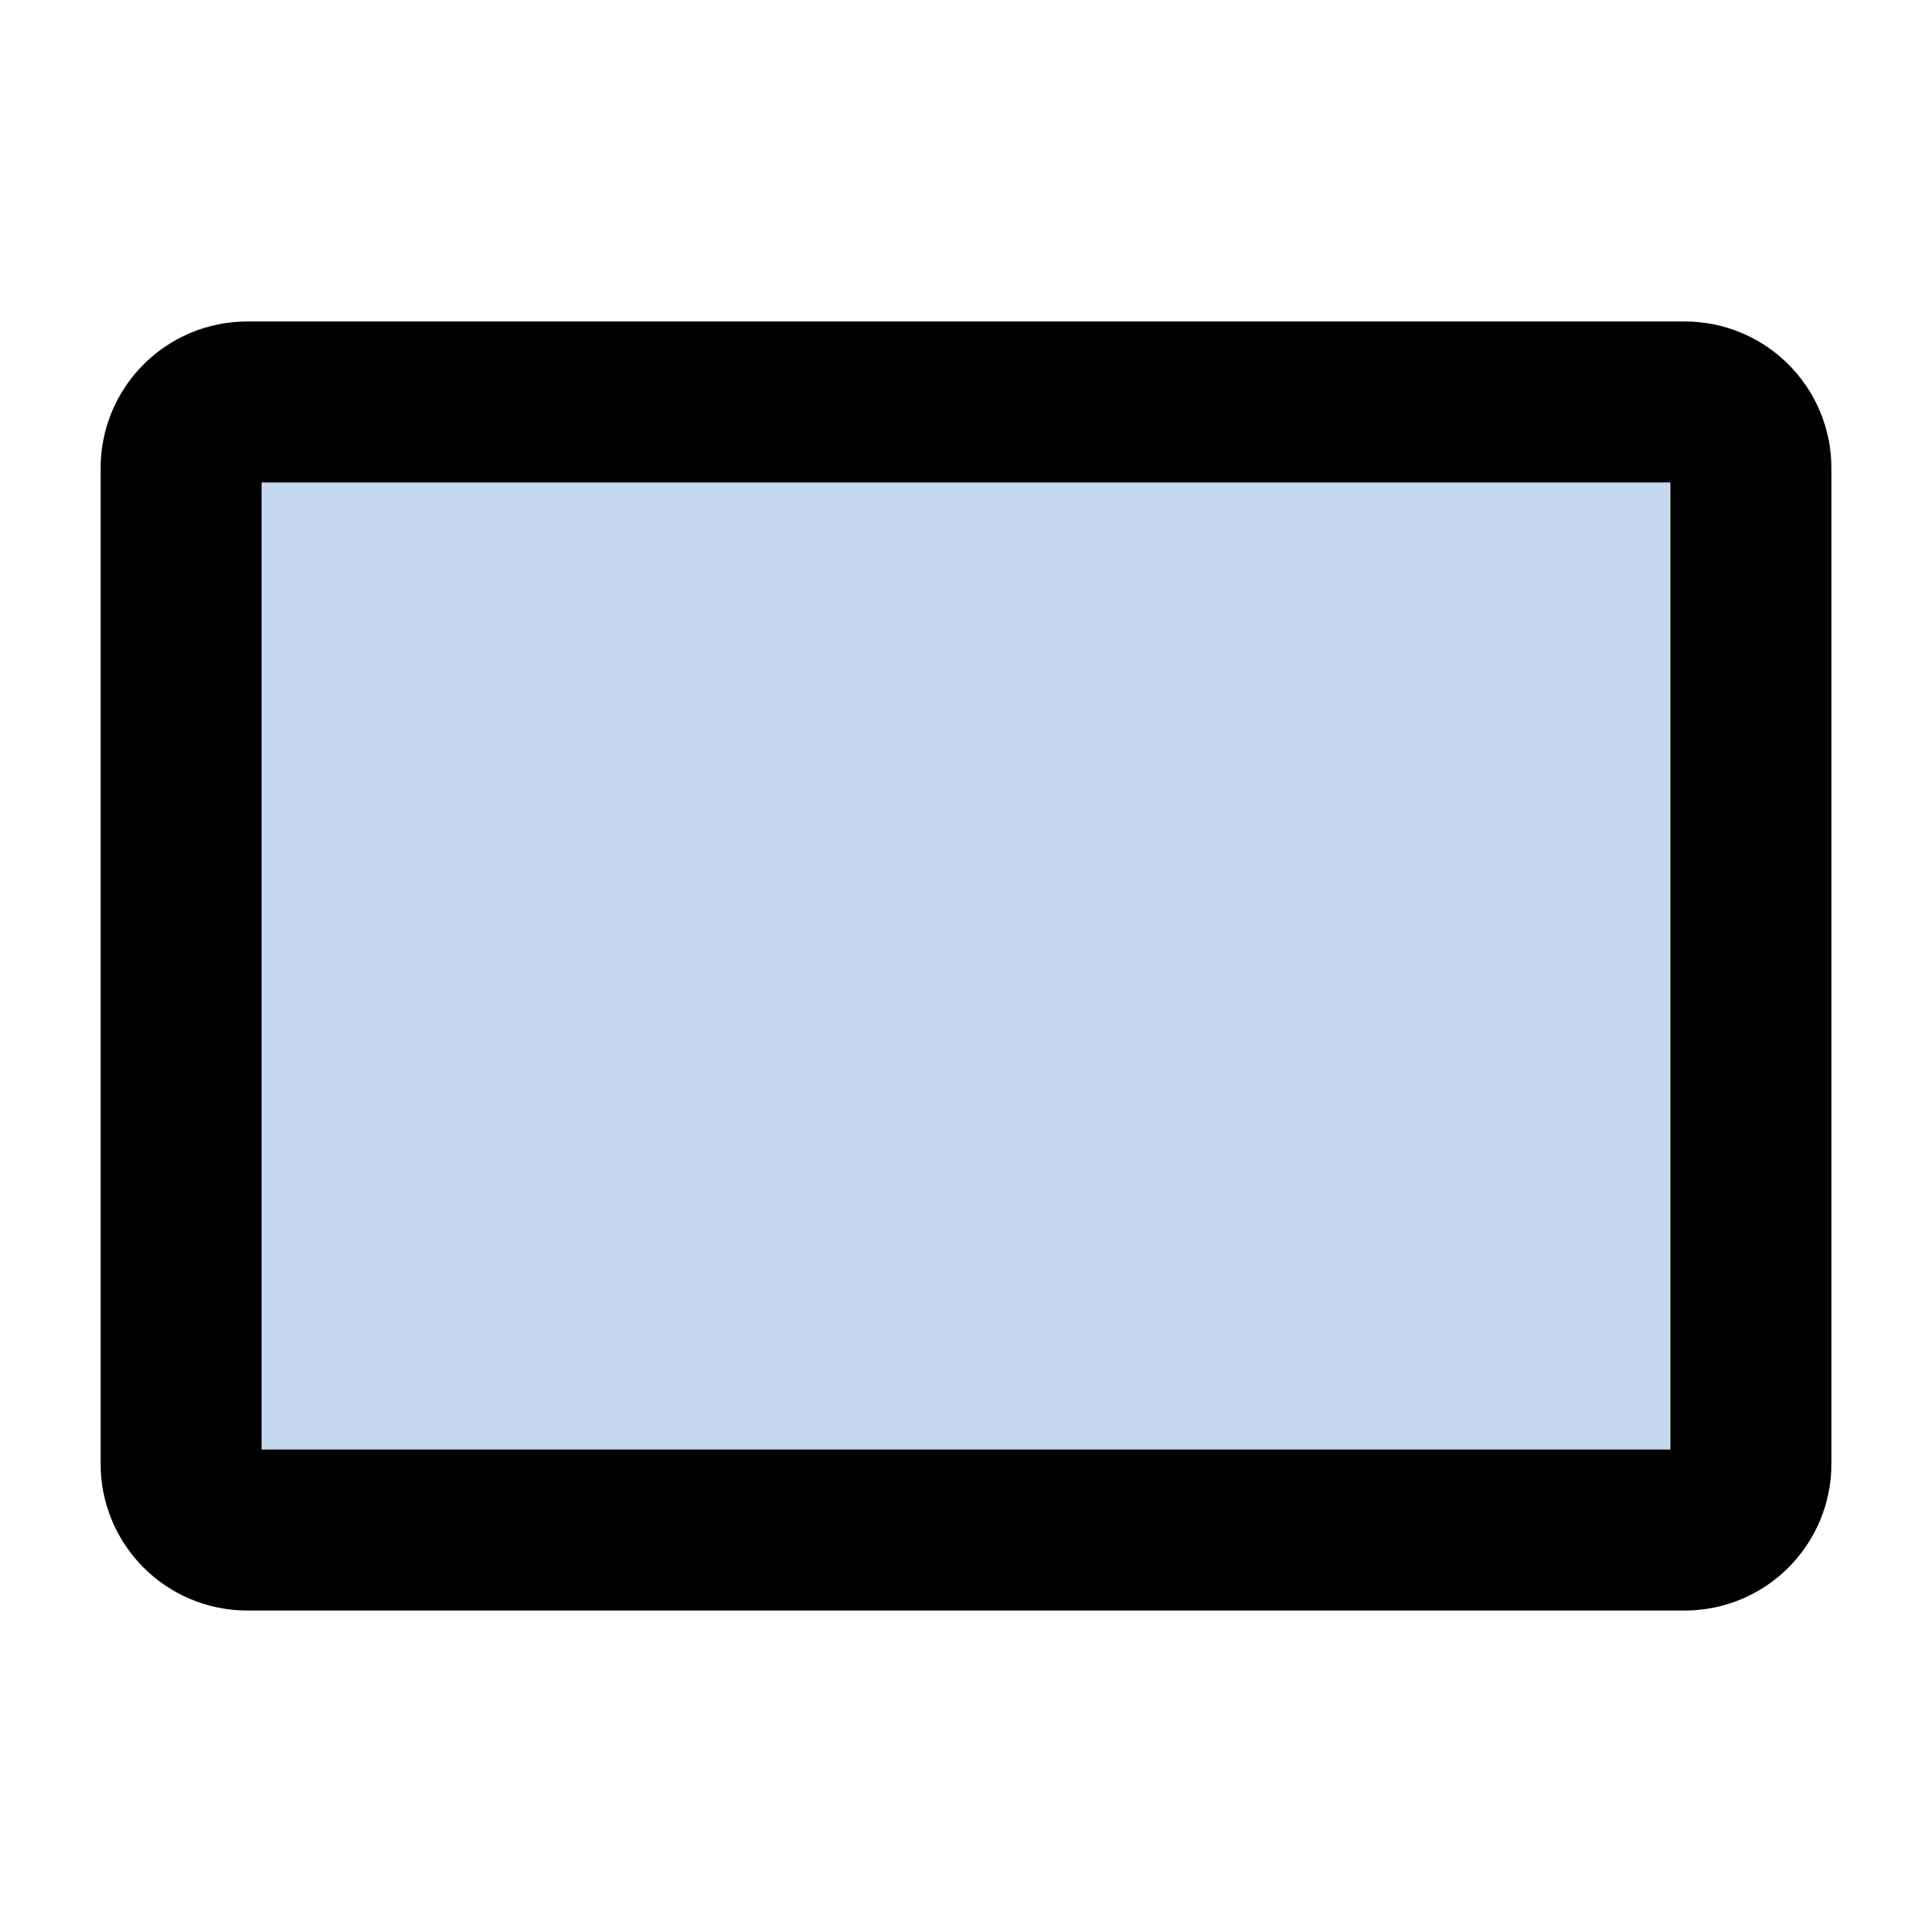 Information clipart primary. Rectangle big frames illustrations